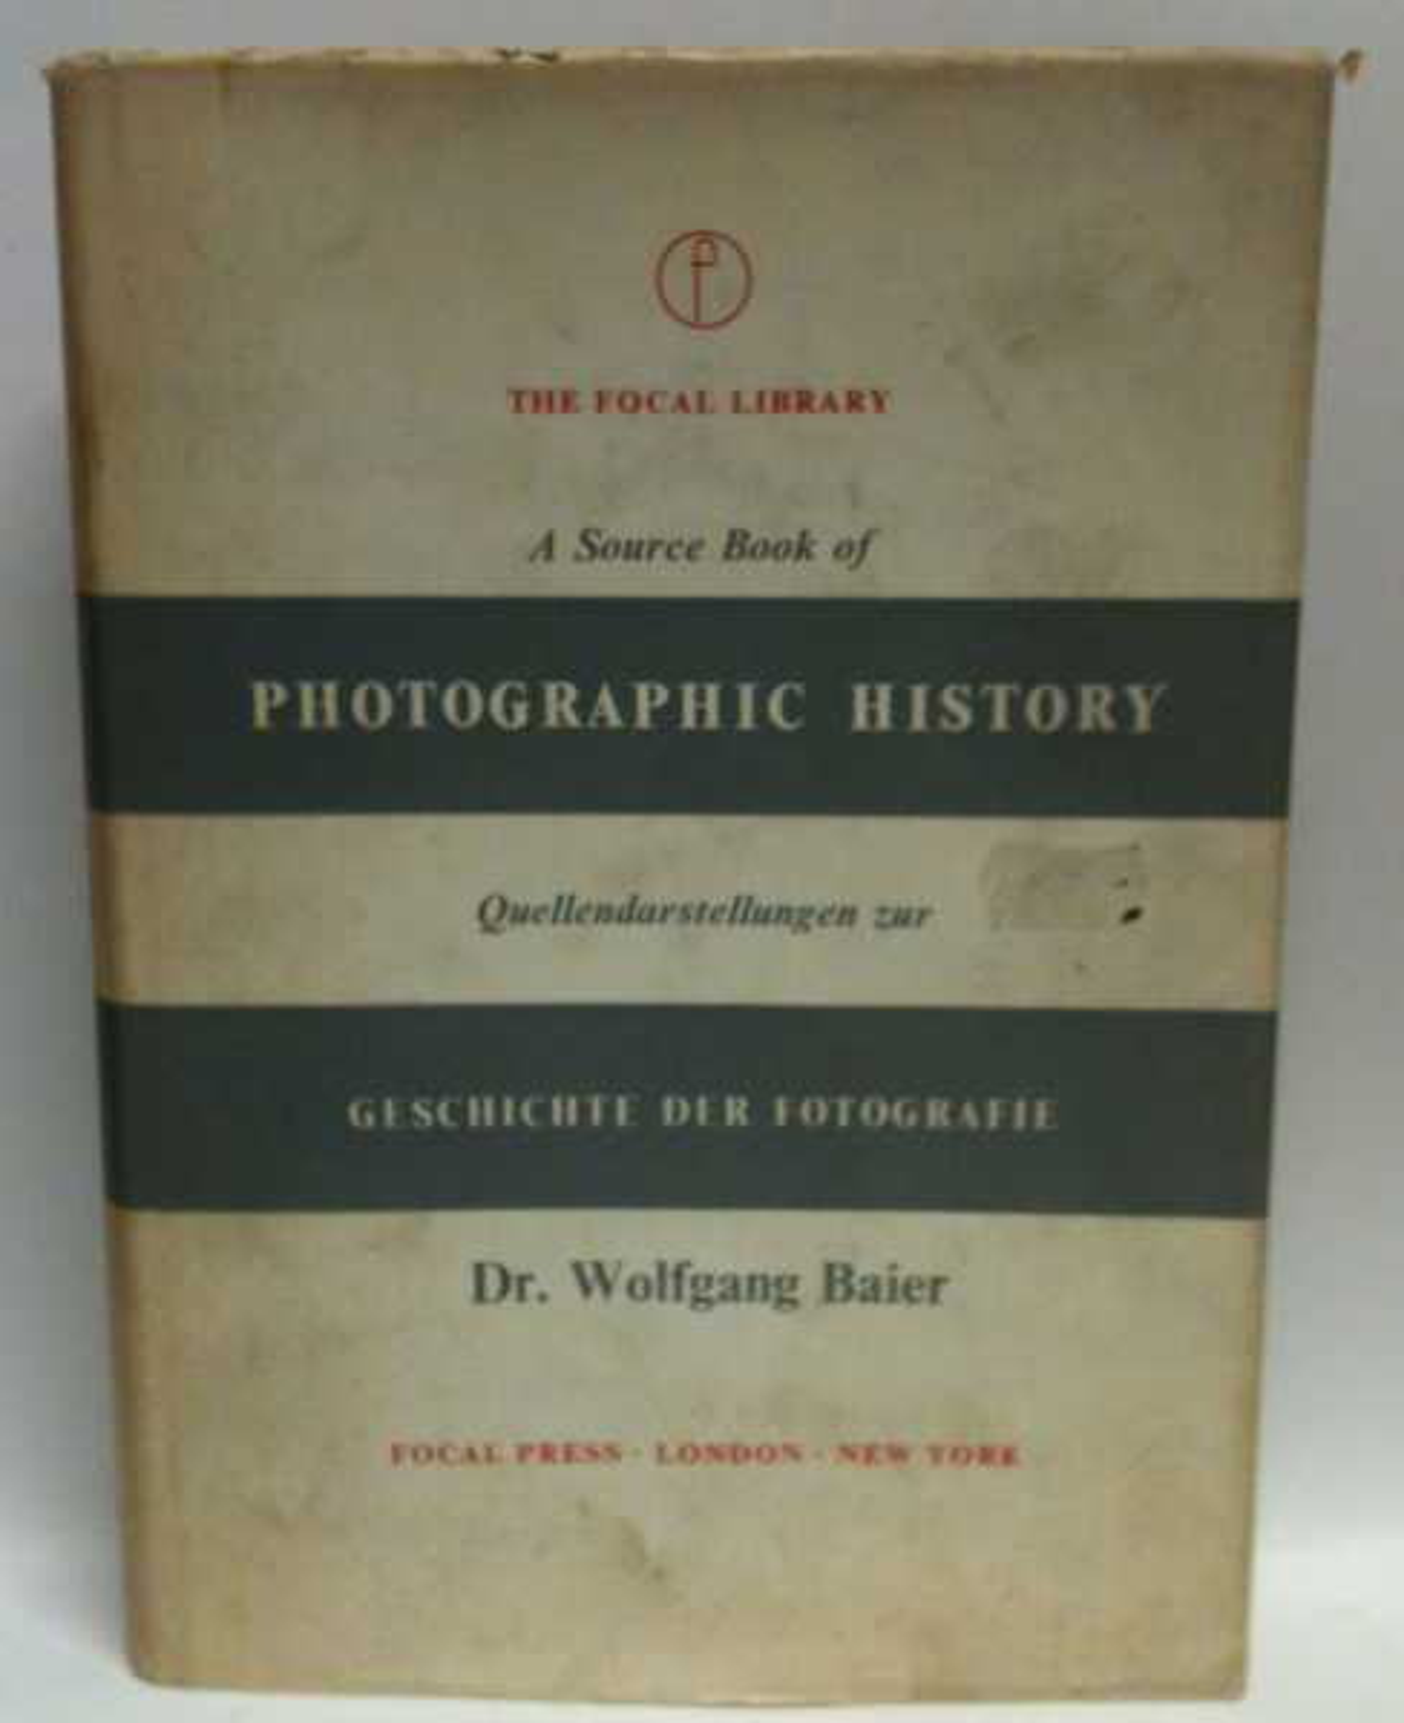 A Source Book of Photographic History / Quellendarstellungen zur Geschichte der Fotografie, Dr. Wolfgang Baier